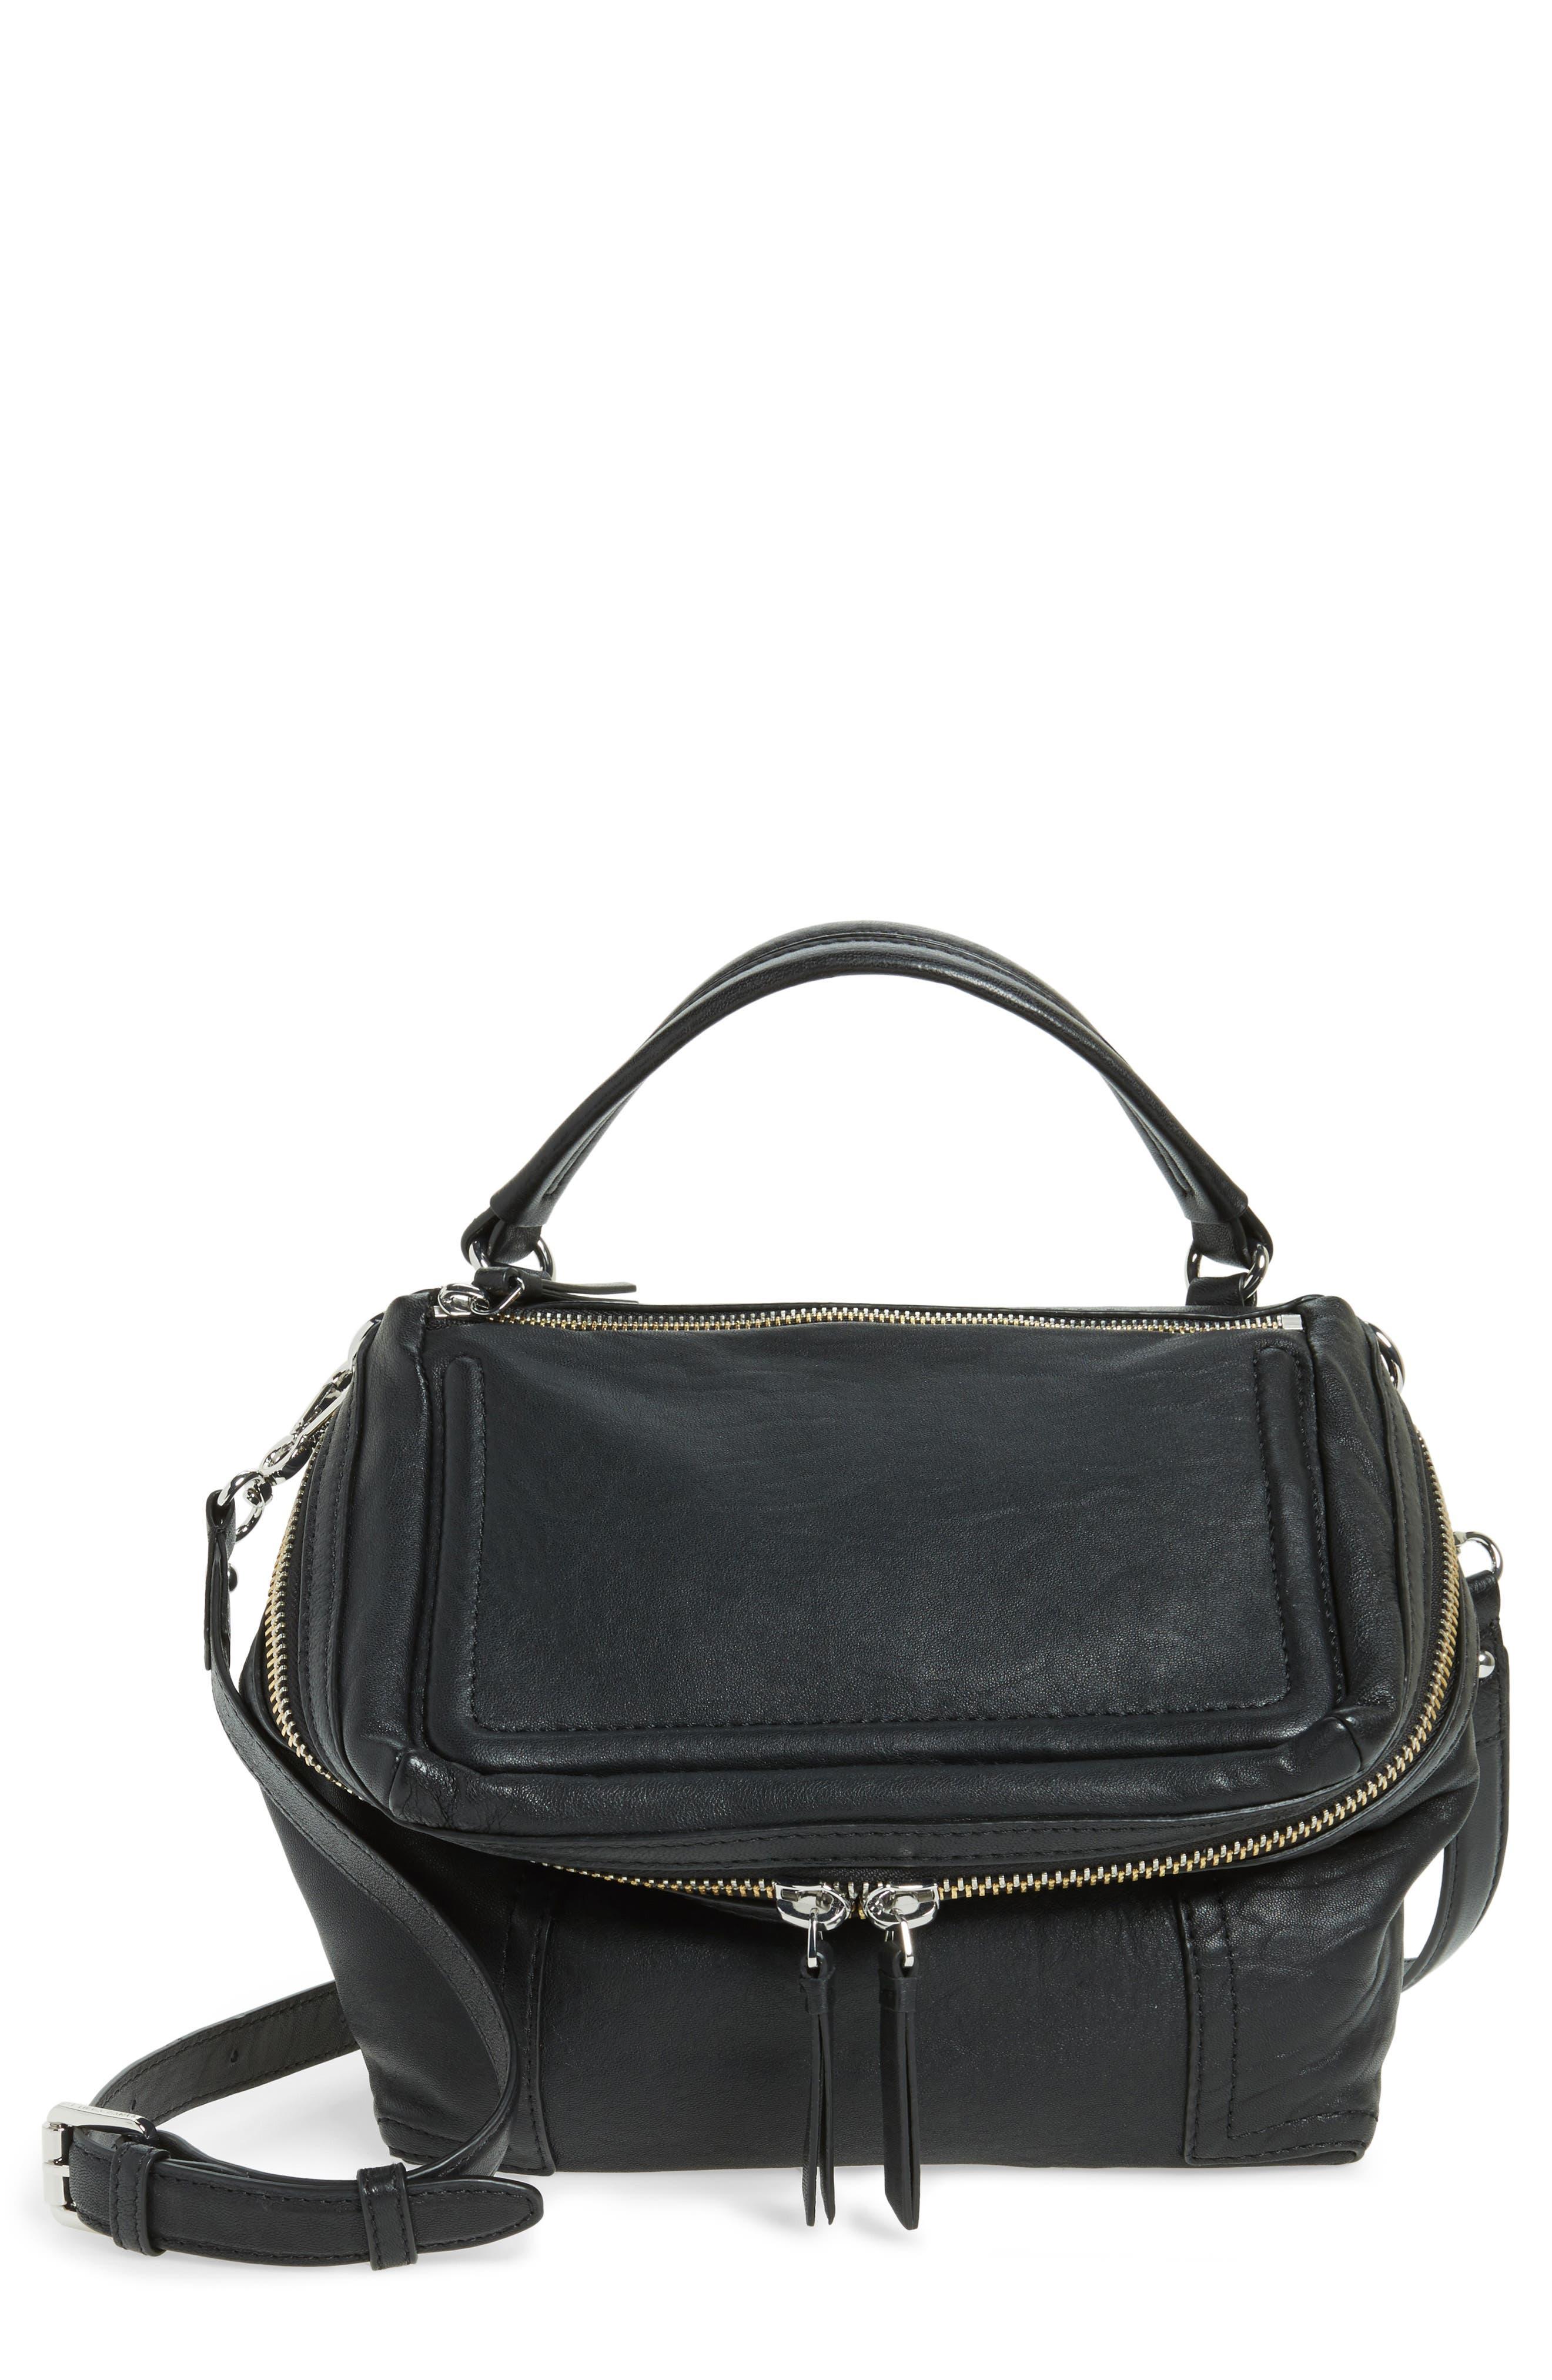 Medium Patch Leather Crossbody Bag,                             Main thumbnail 1, color,                             002